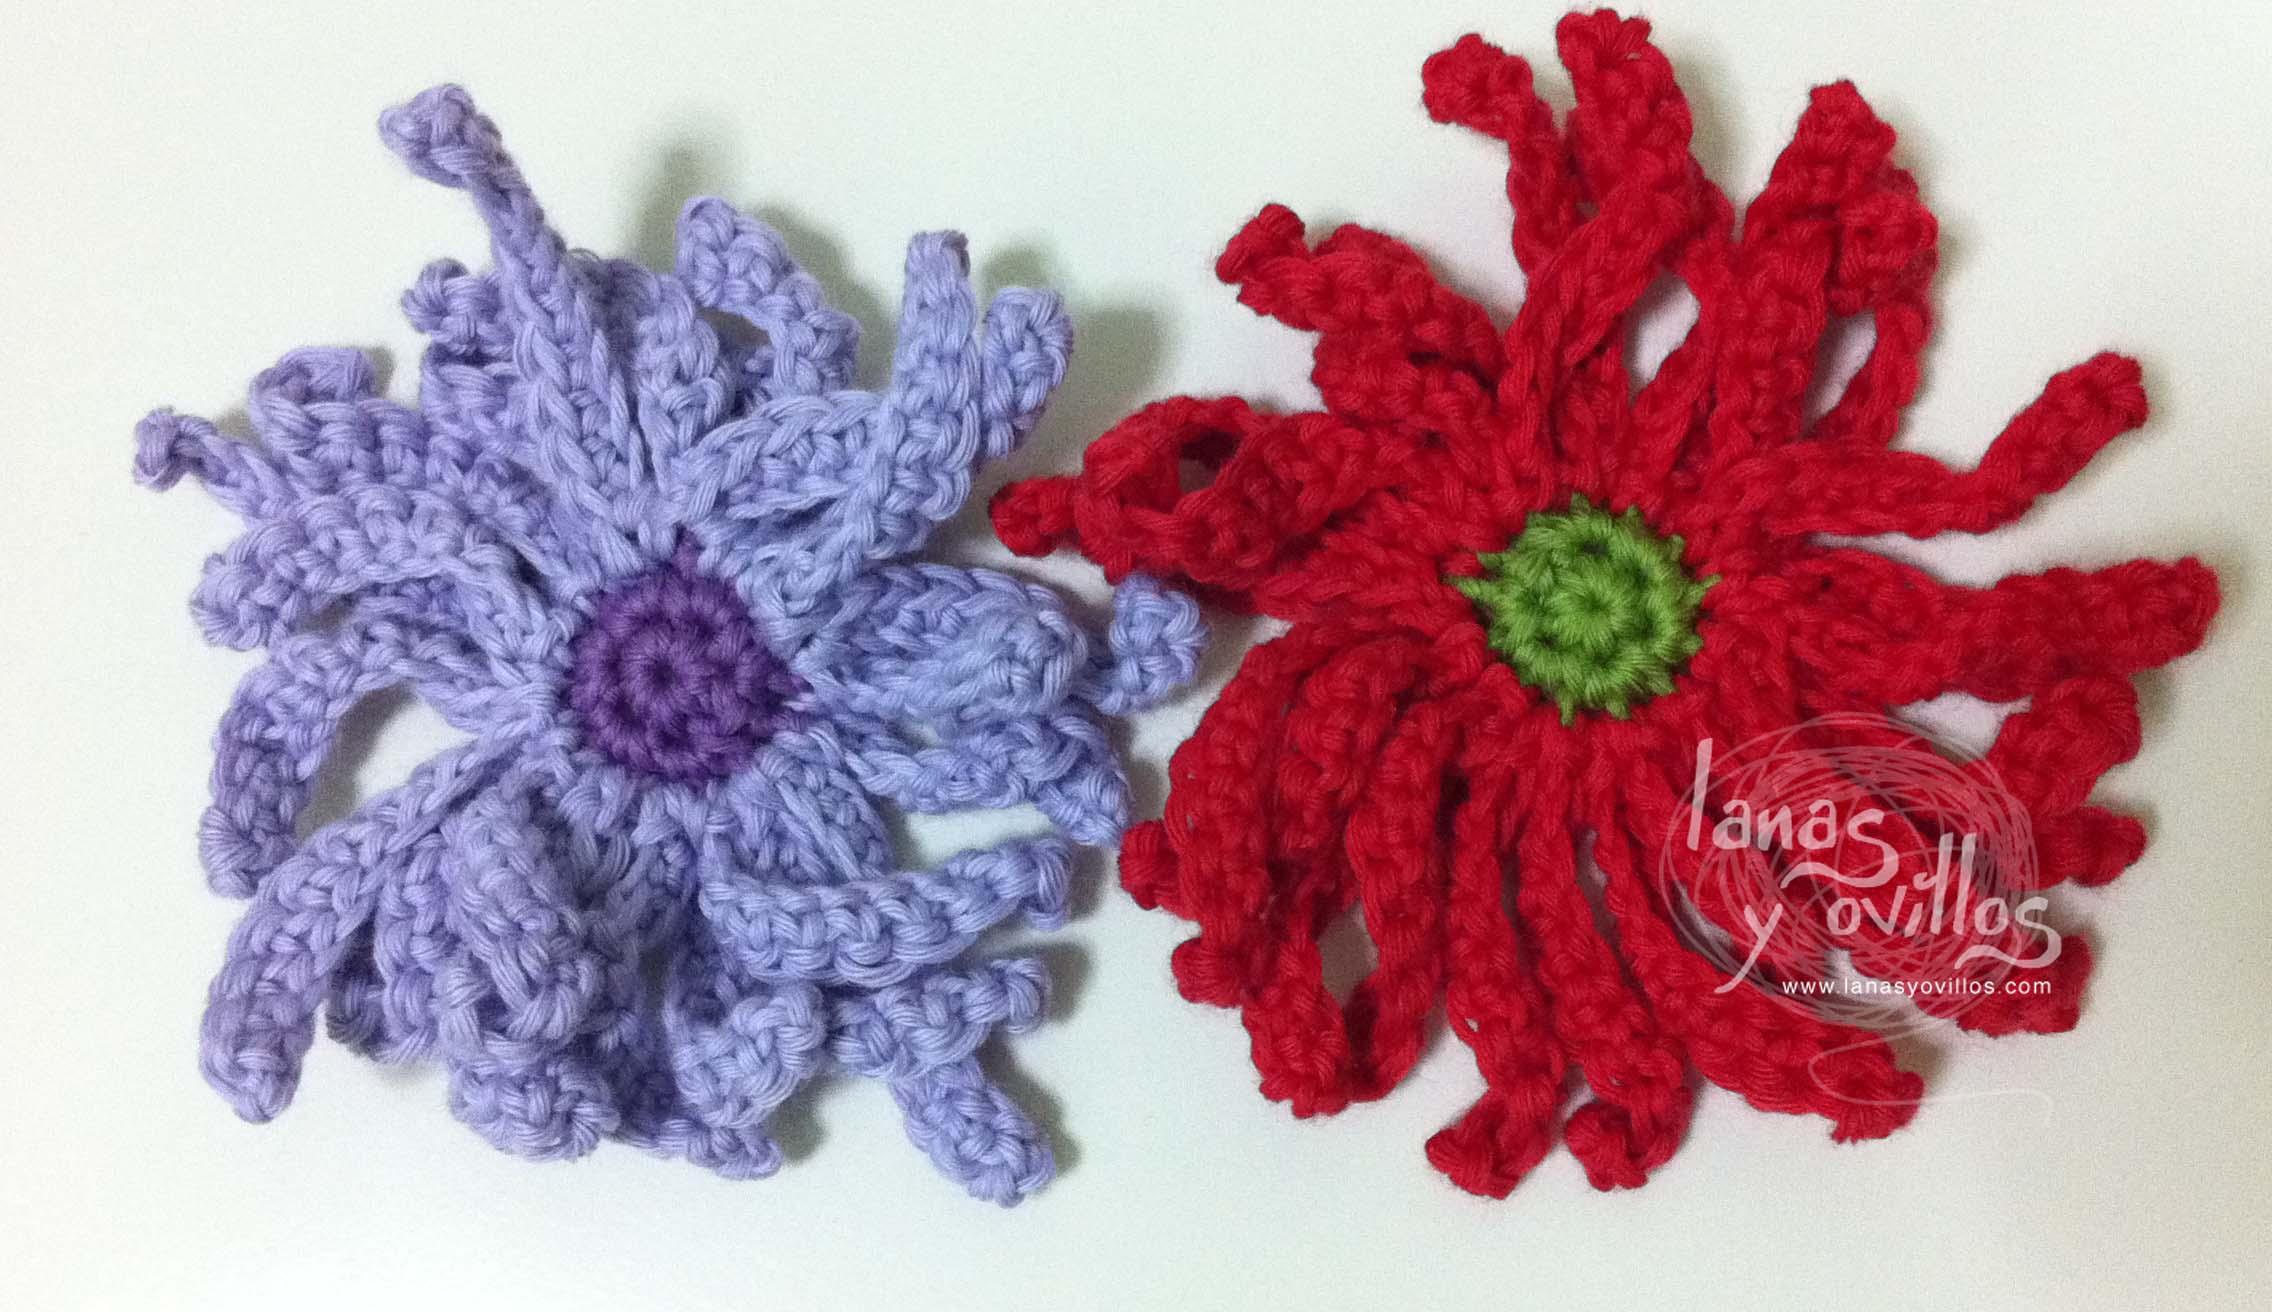 daisy flower crochet free pattern with video tutorial